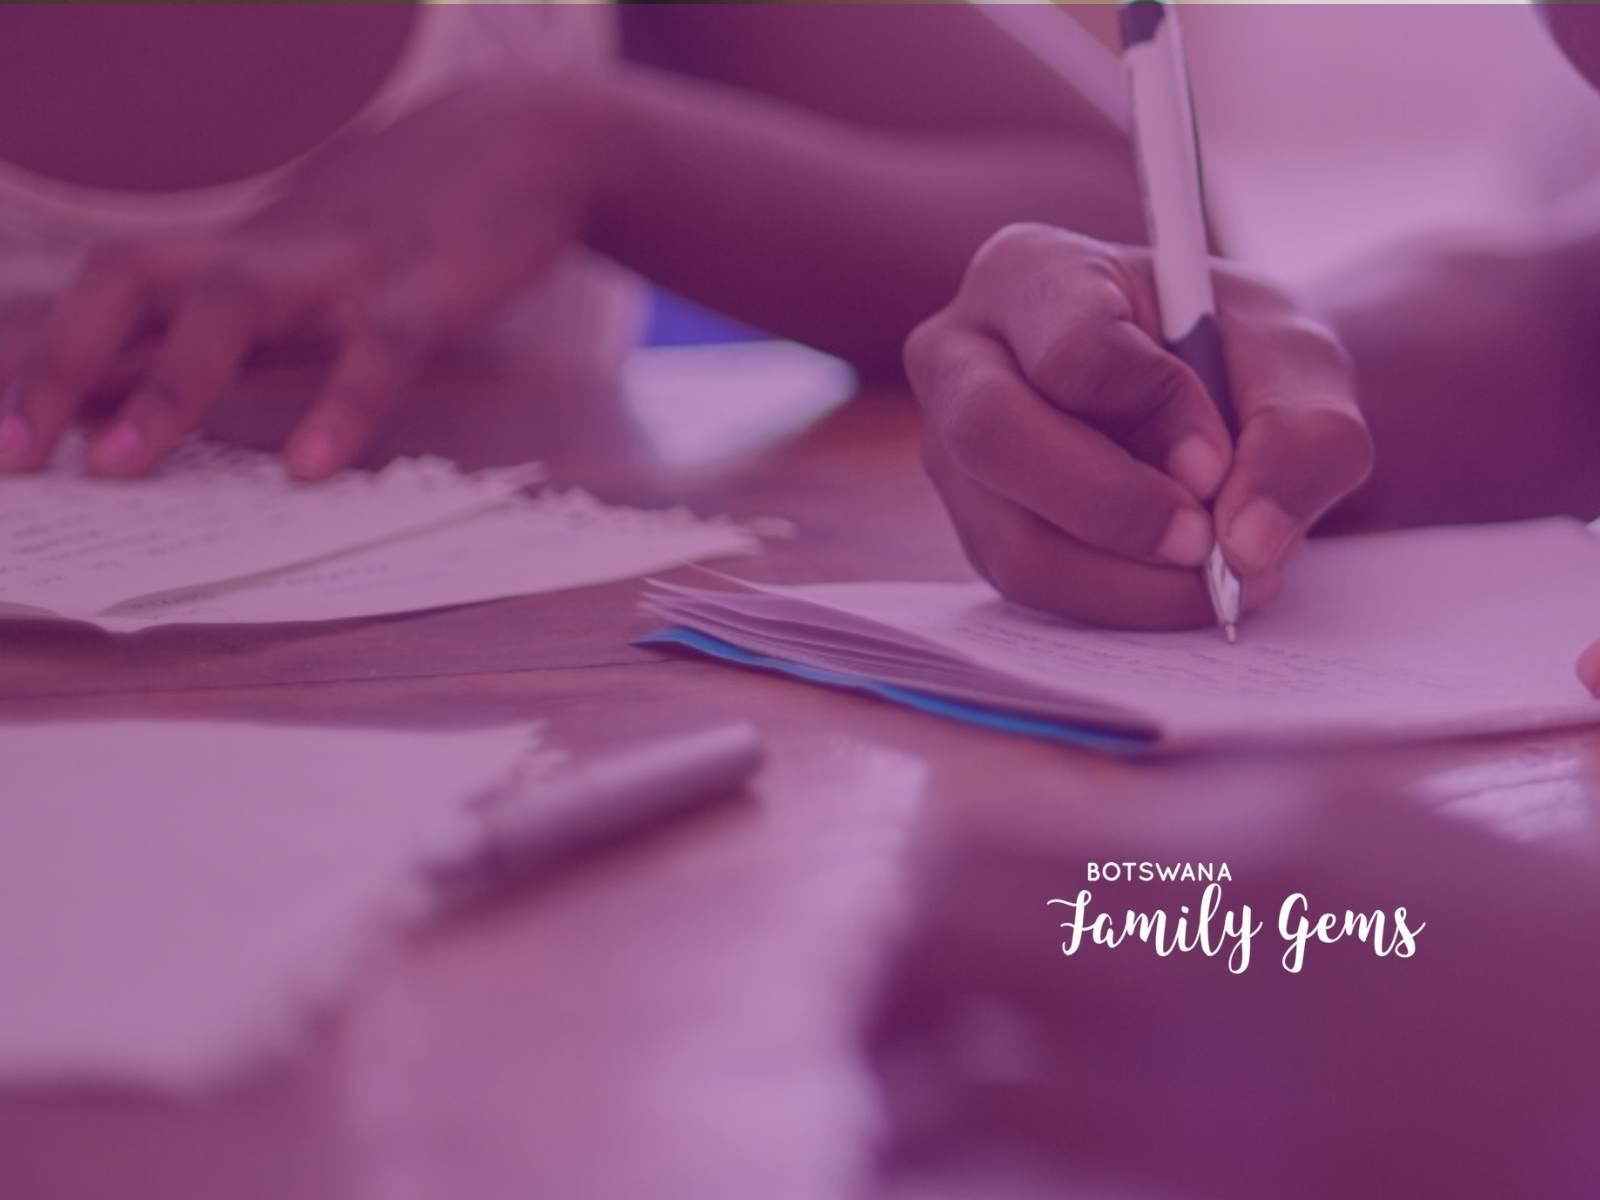 Covid-19 Botswana HomeSchooling